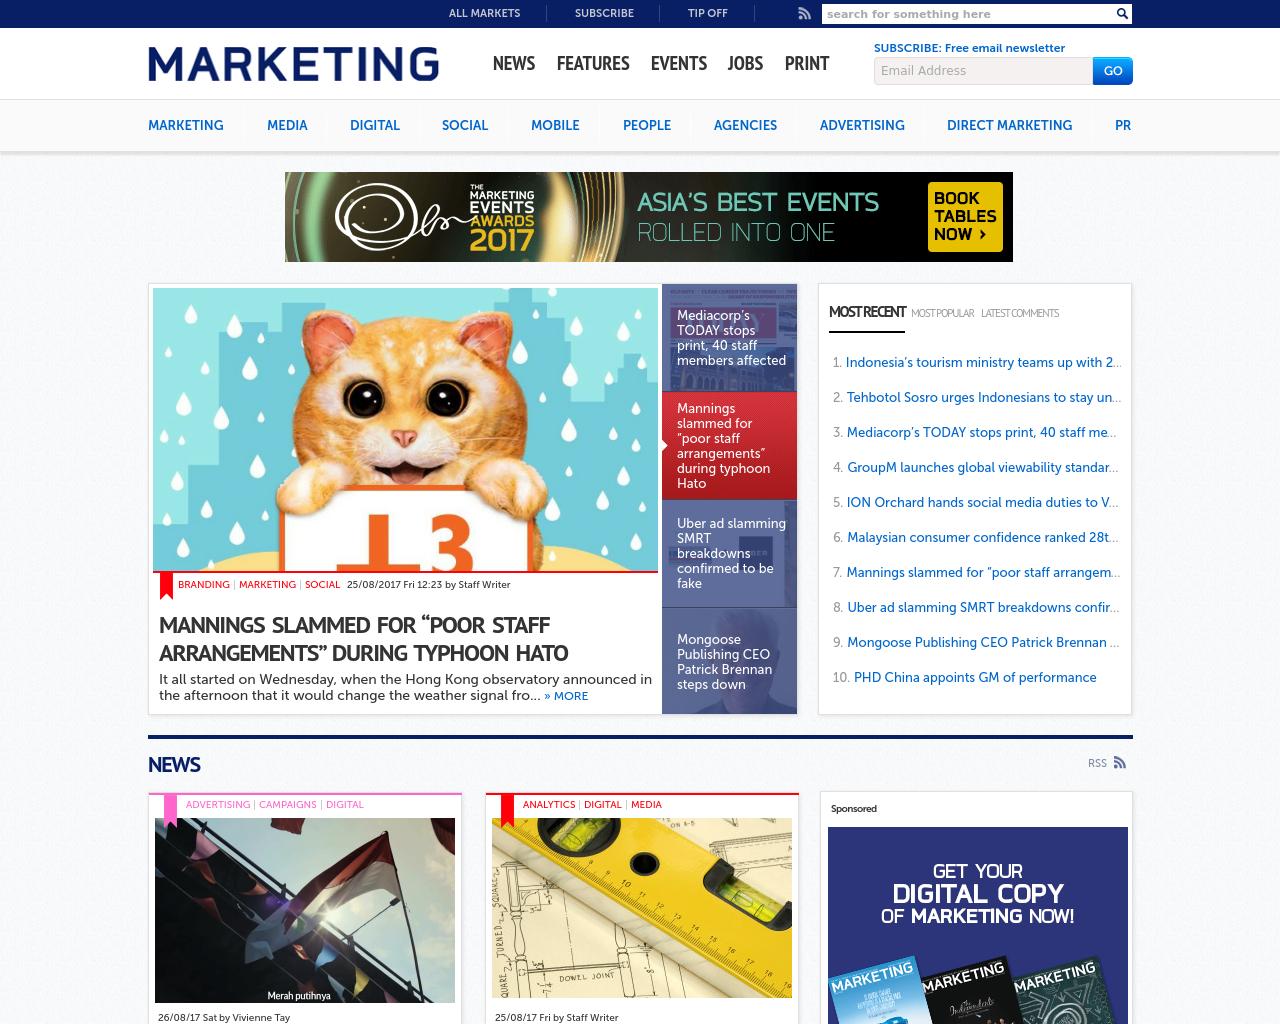 Marketing-Interactive-Advertising-Reviews-Pricing